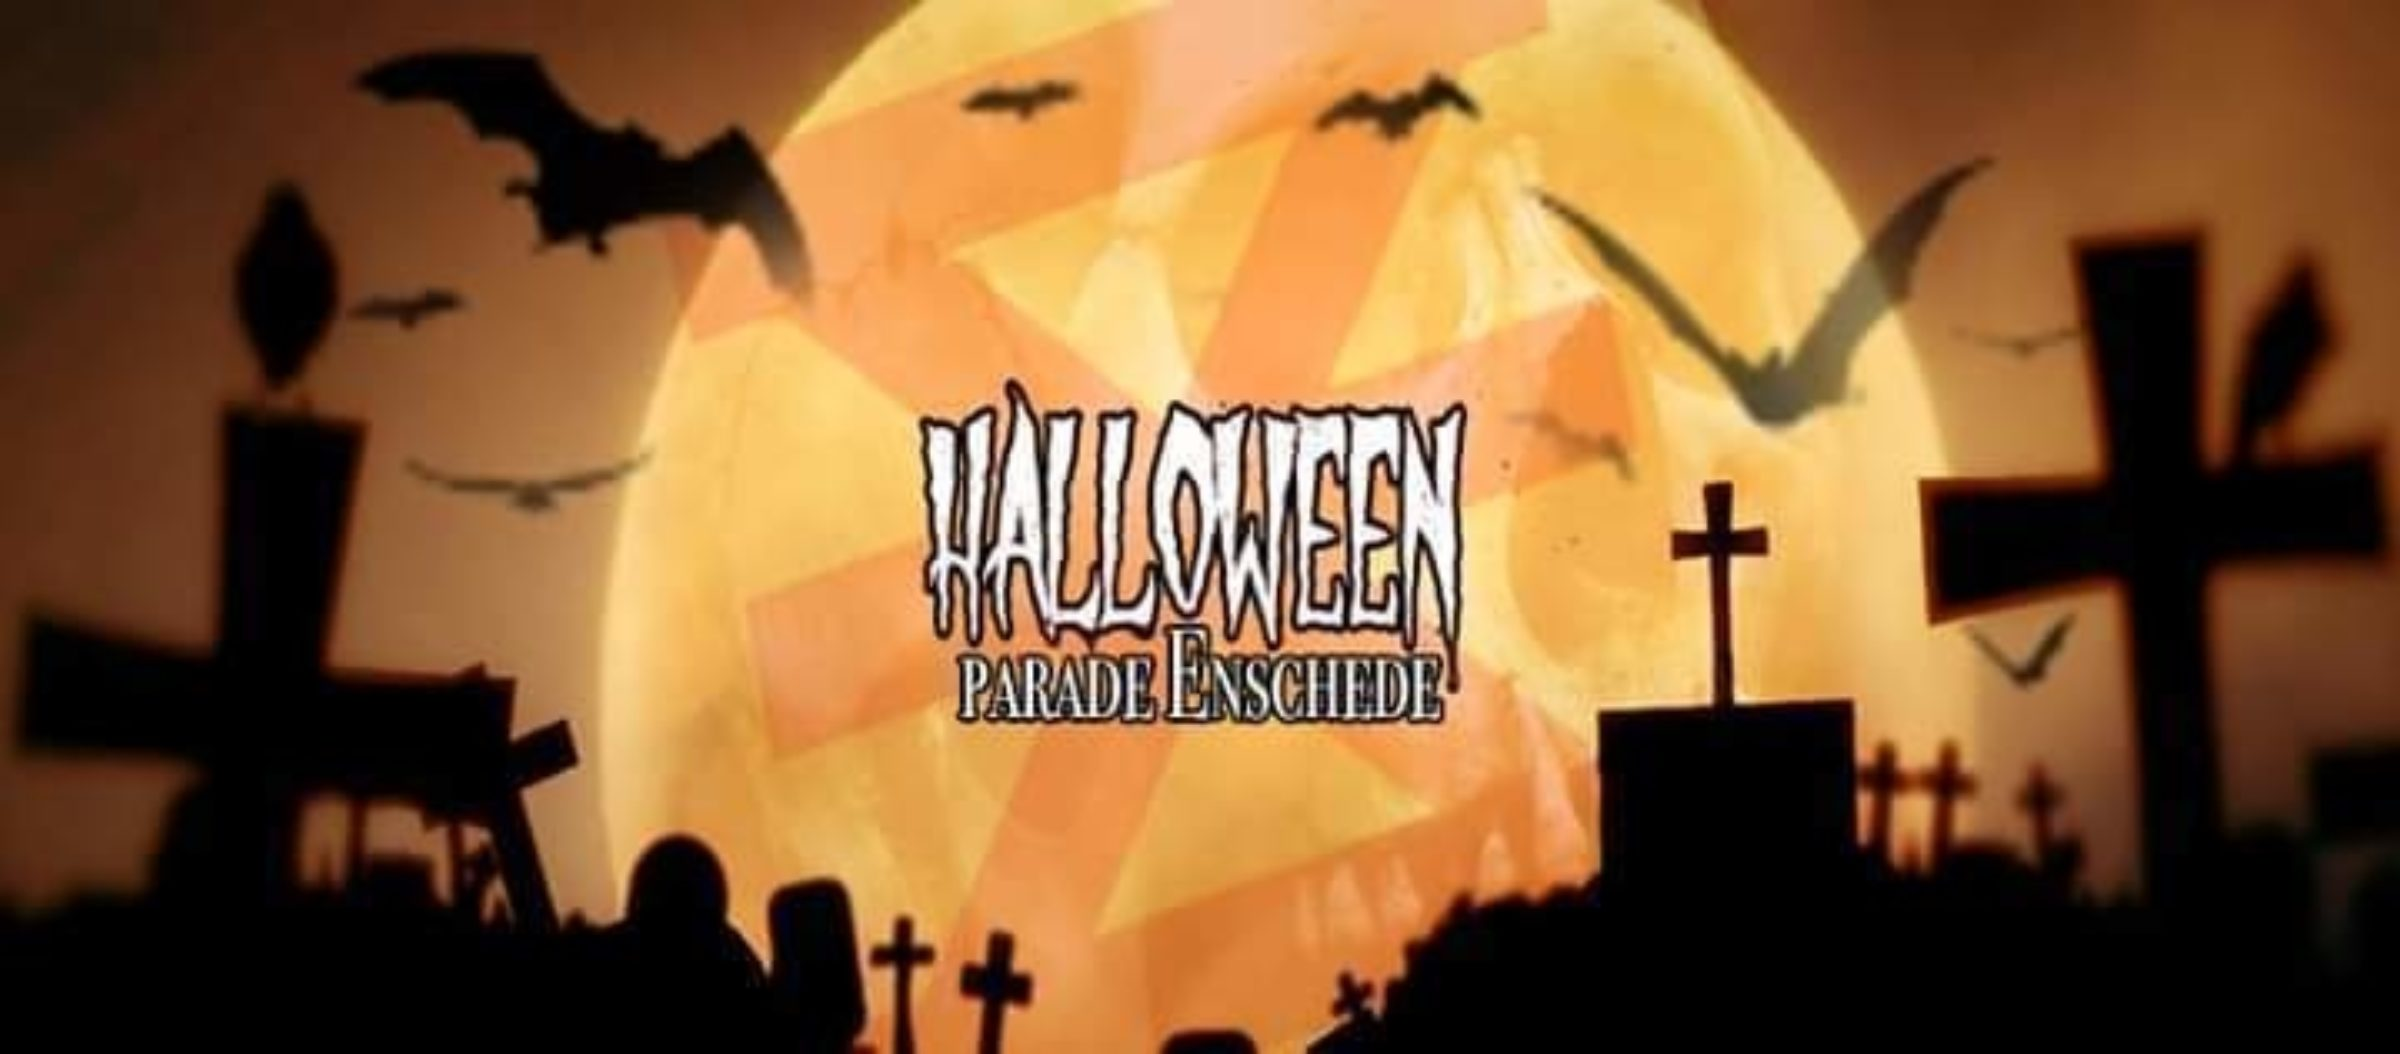 Halloweenparade2019 3443 1568202362 35hxo9el59